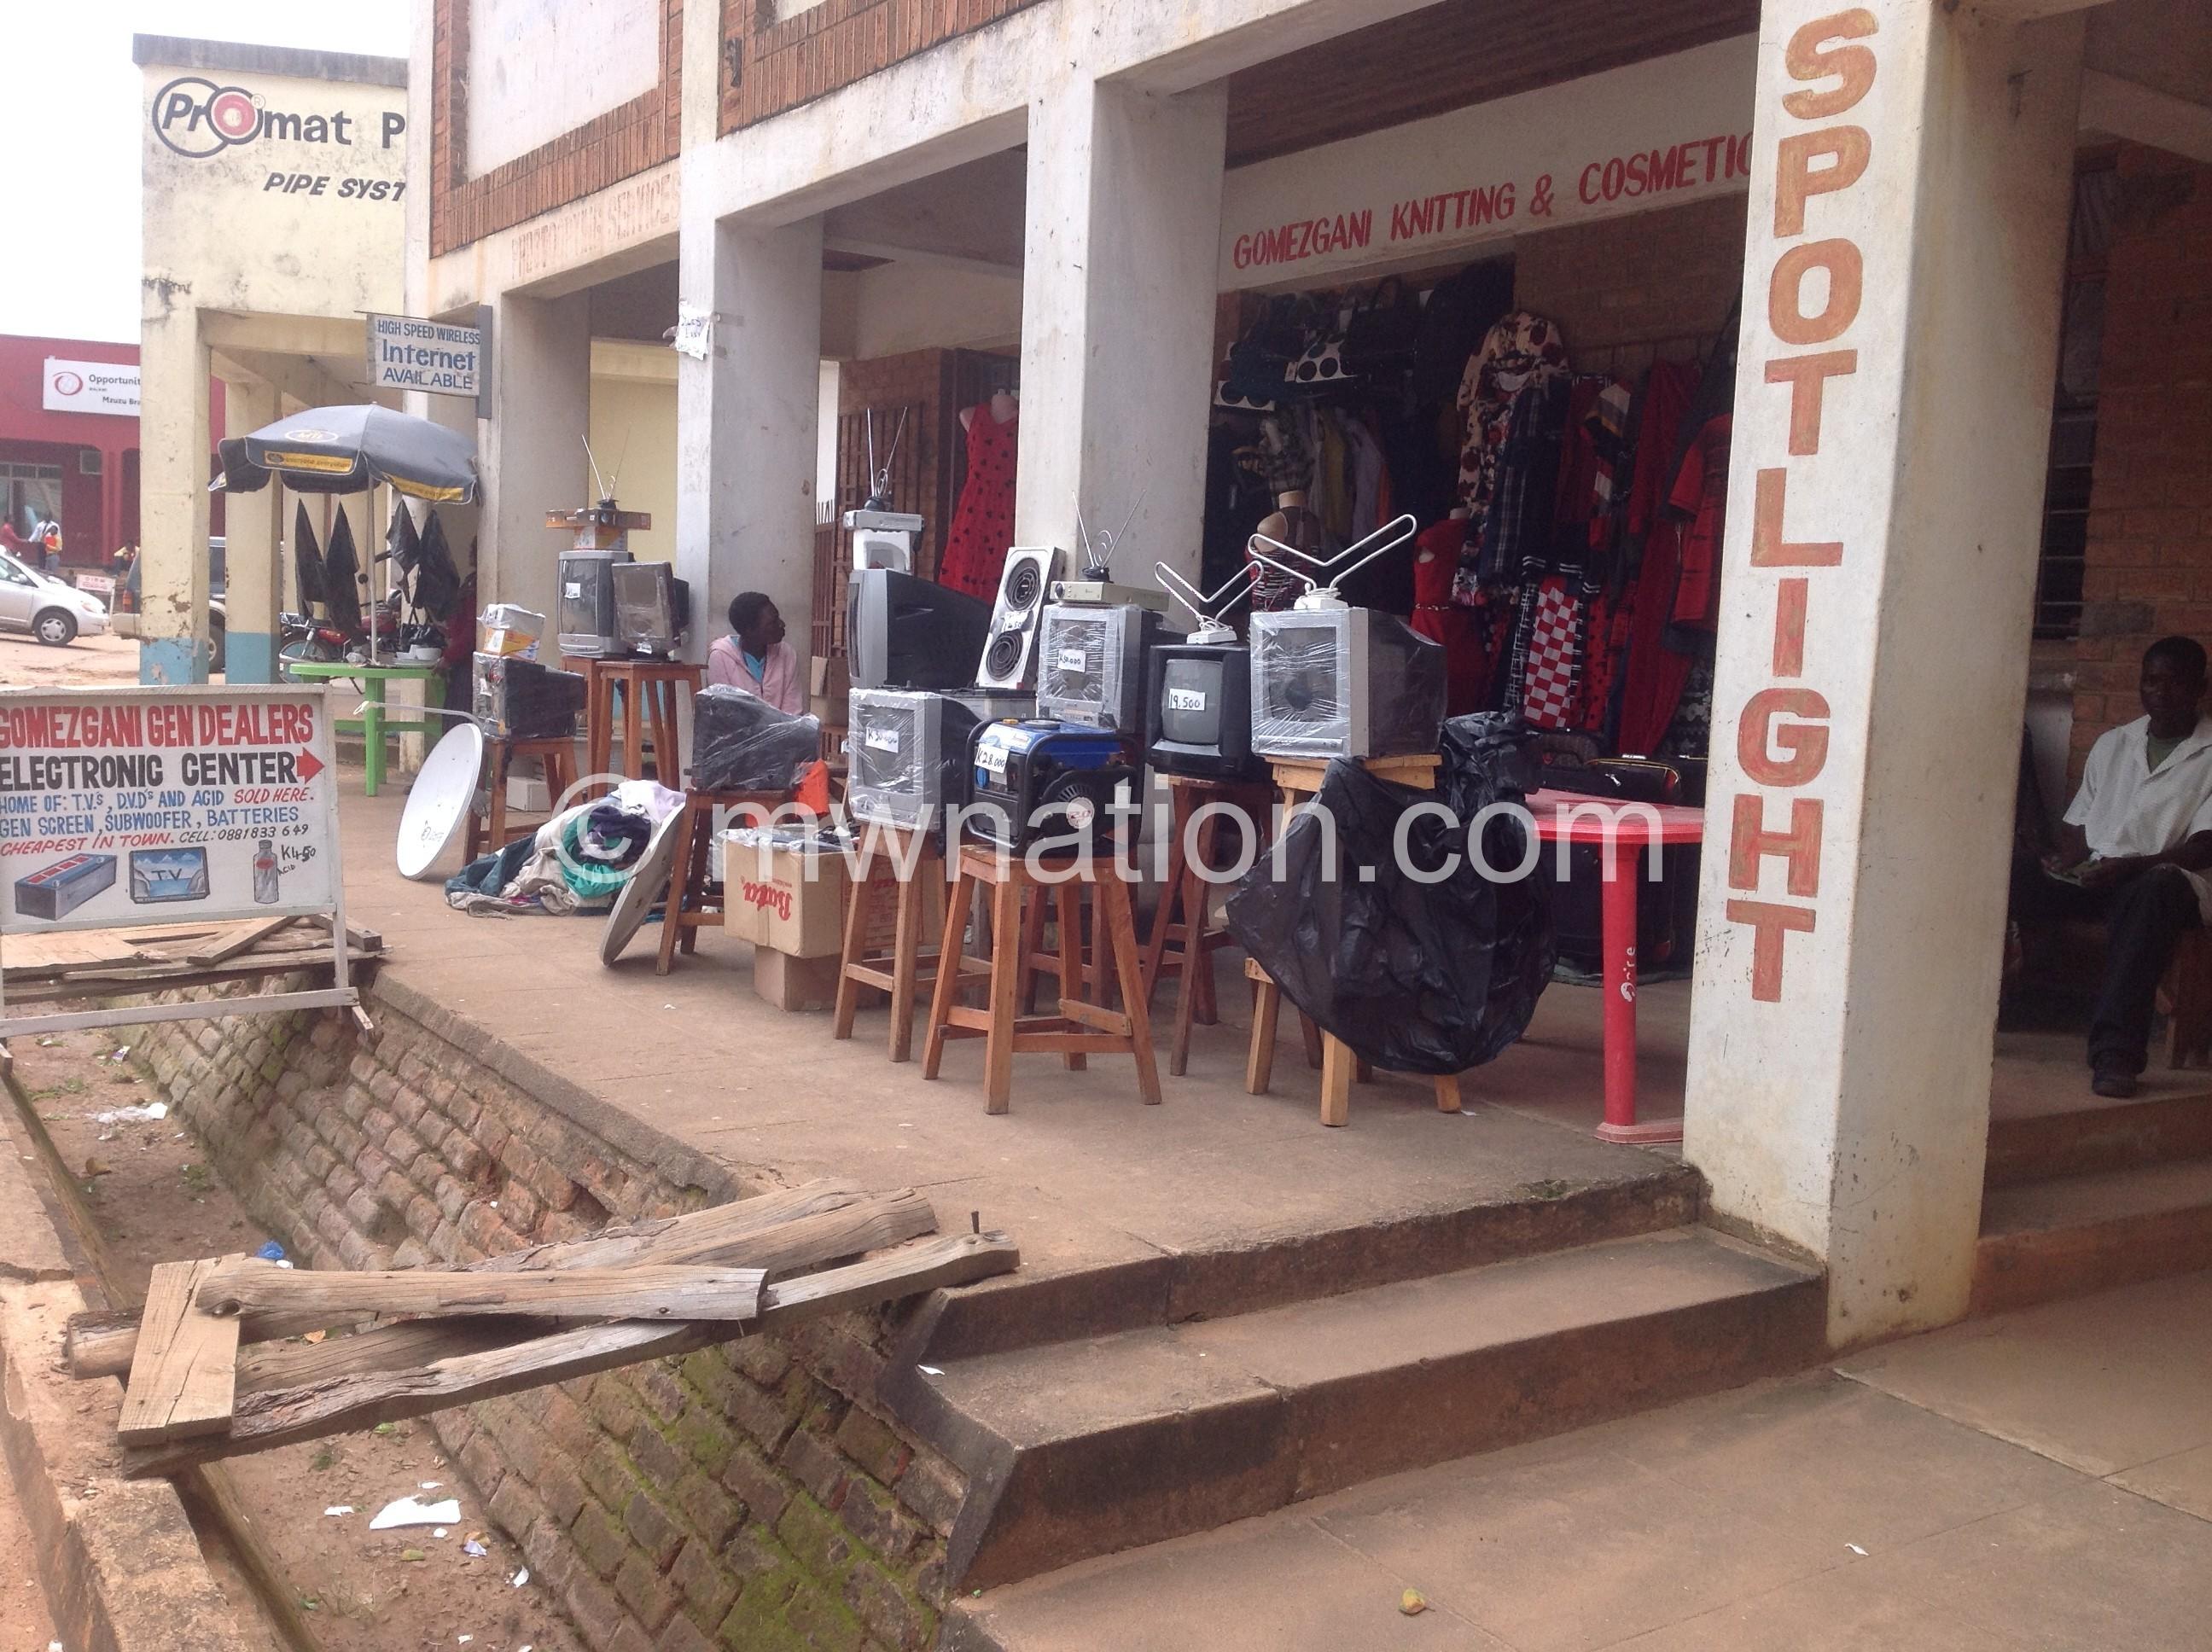 Nyirenda displays analogue antennae outside his shop in Mzuzu